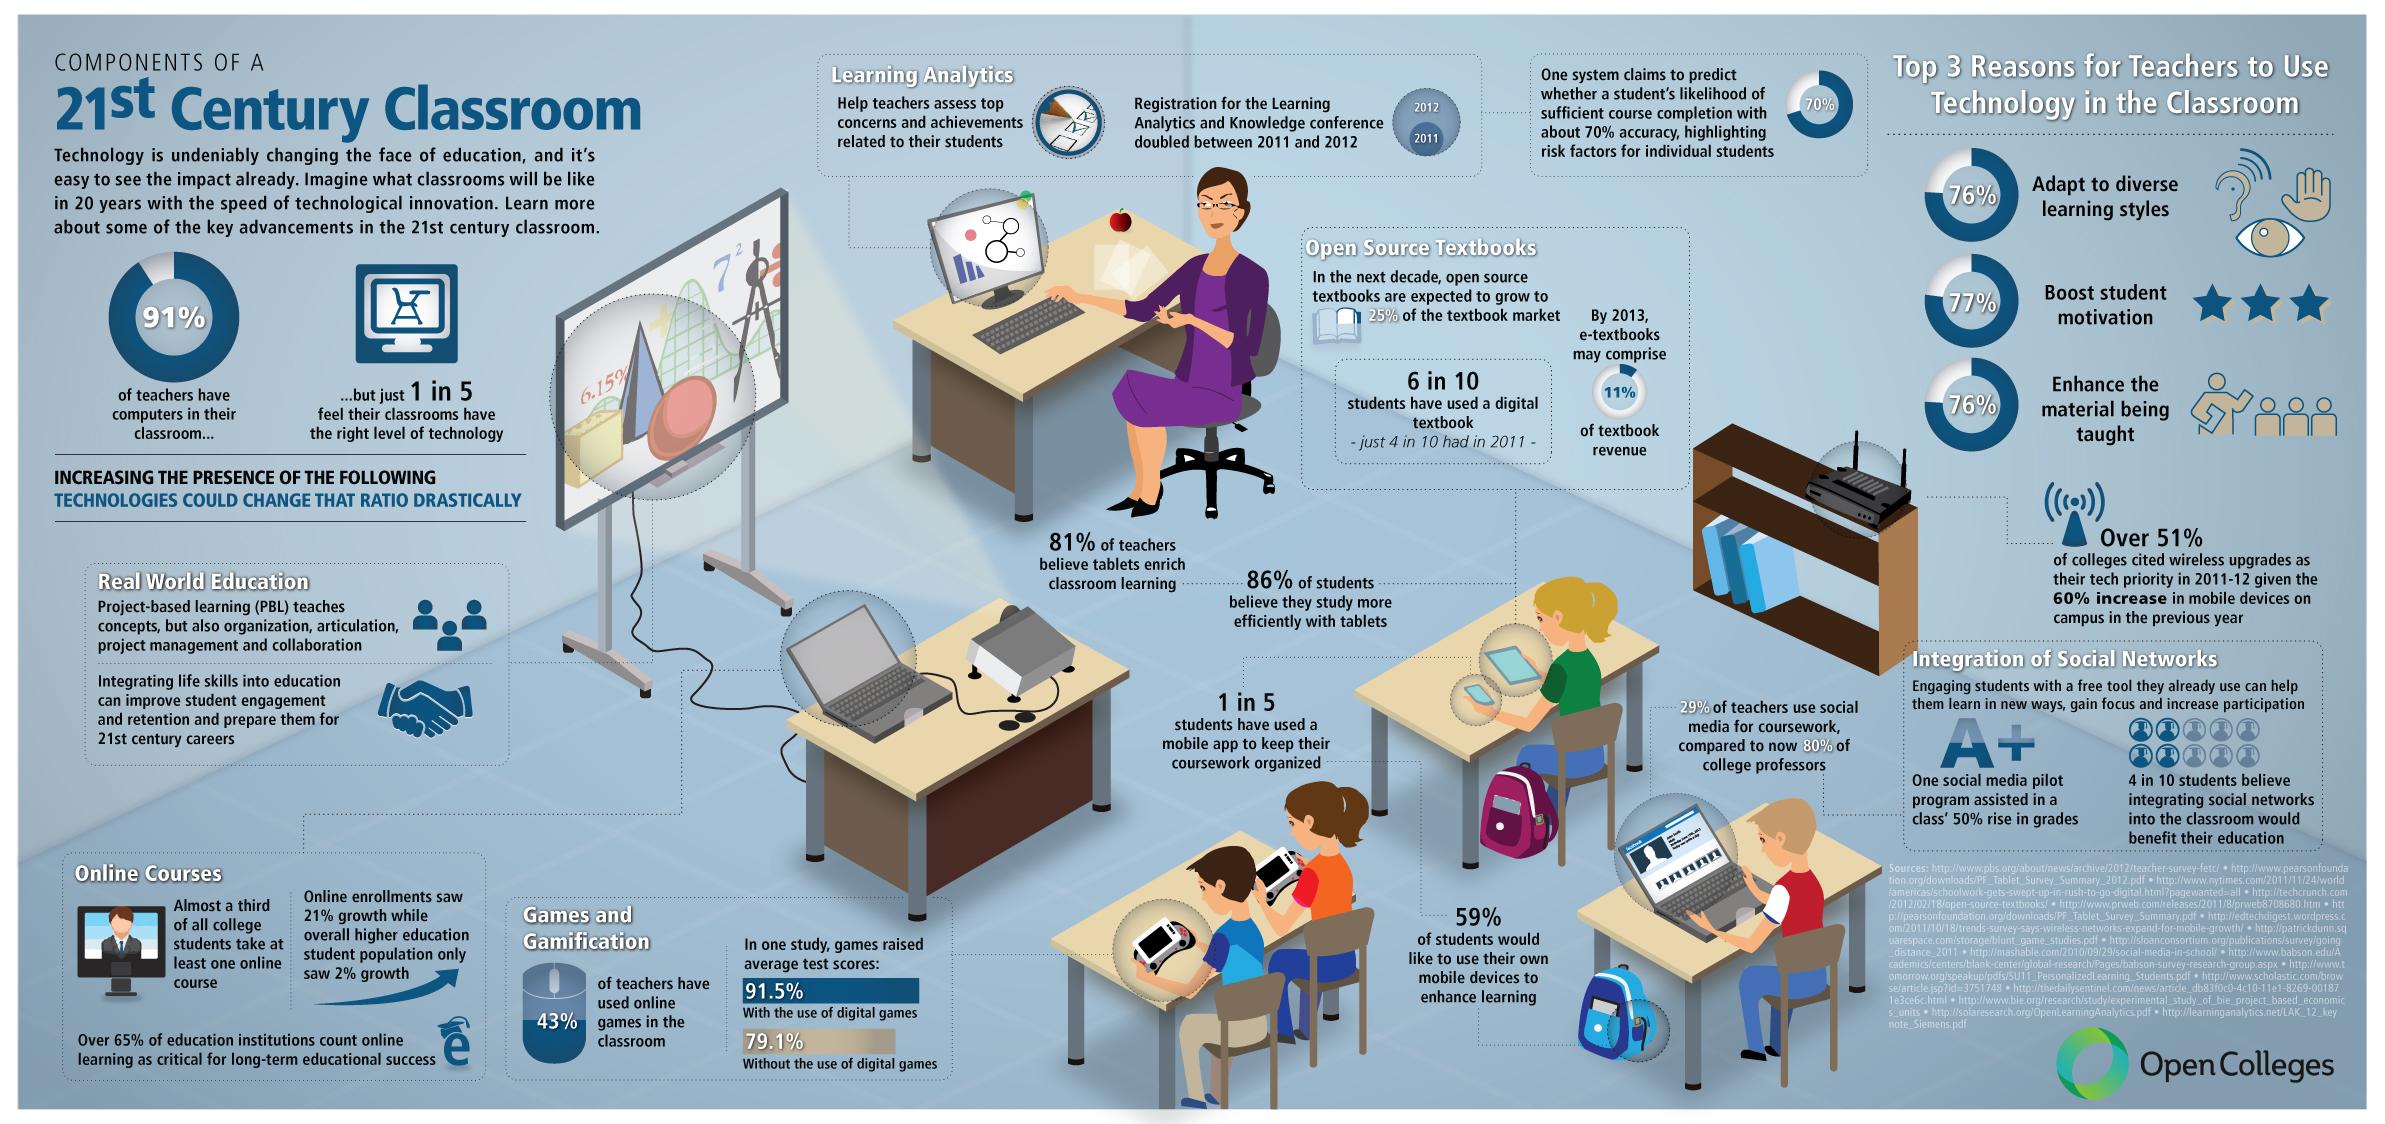 21st Century Classroom Technology